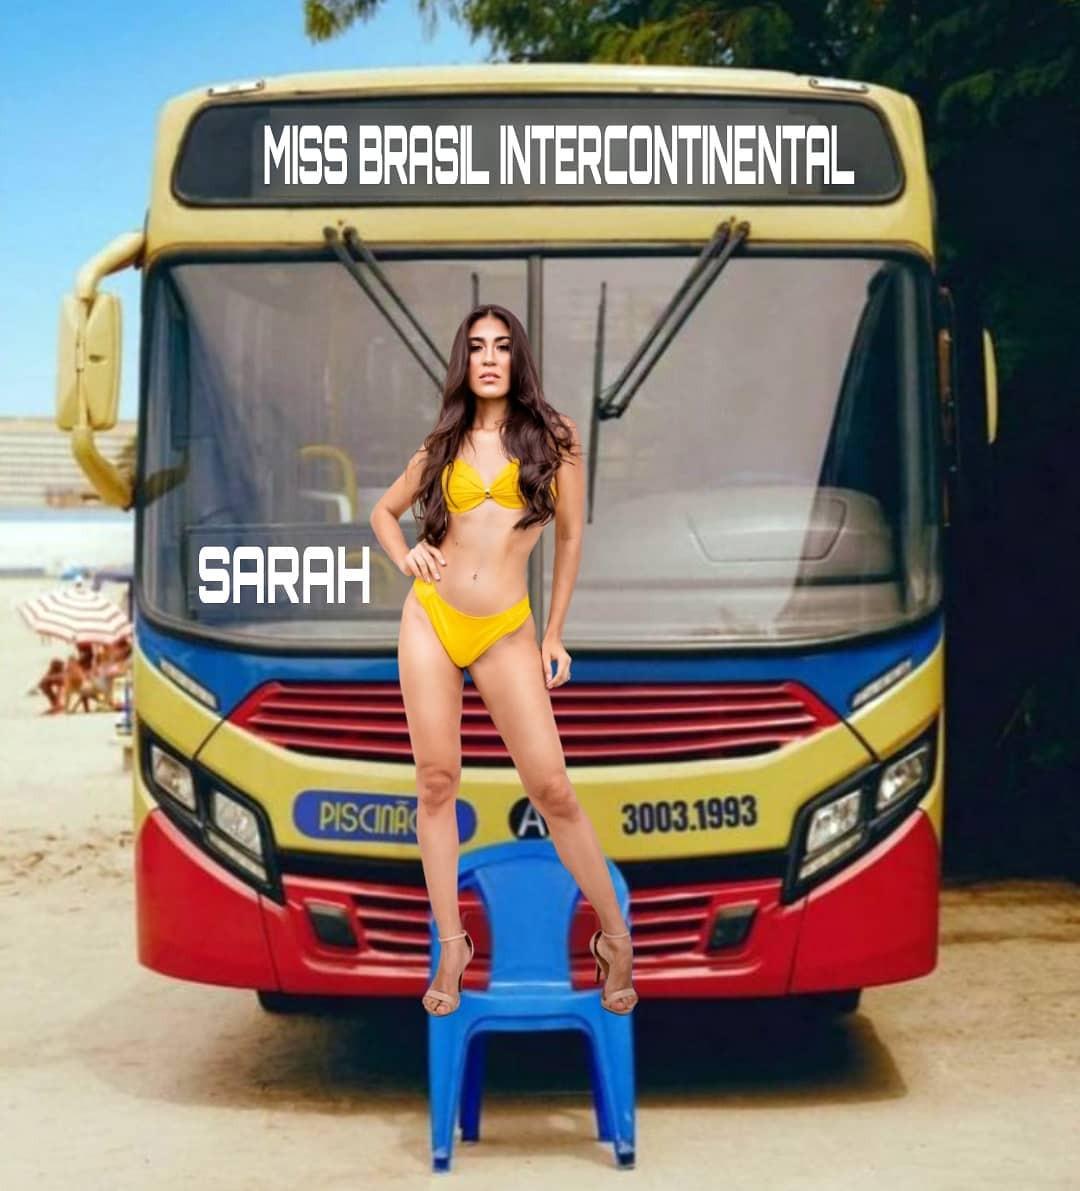 sarah chinikoski, miss brasil intercontinental 2021. Bdbokg10